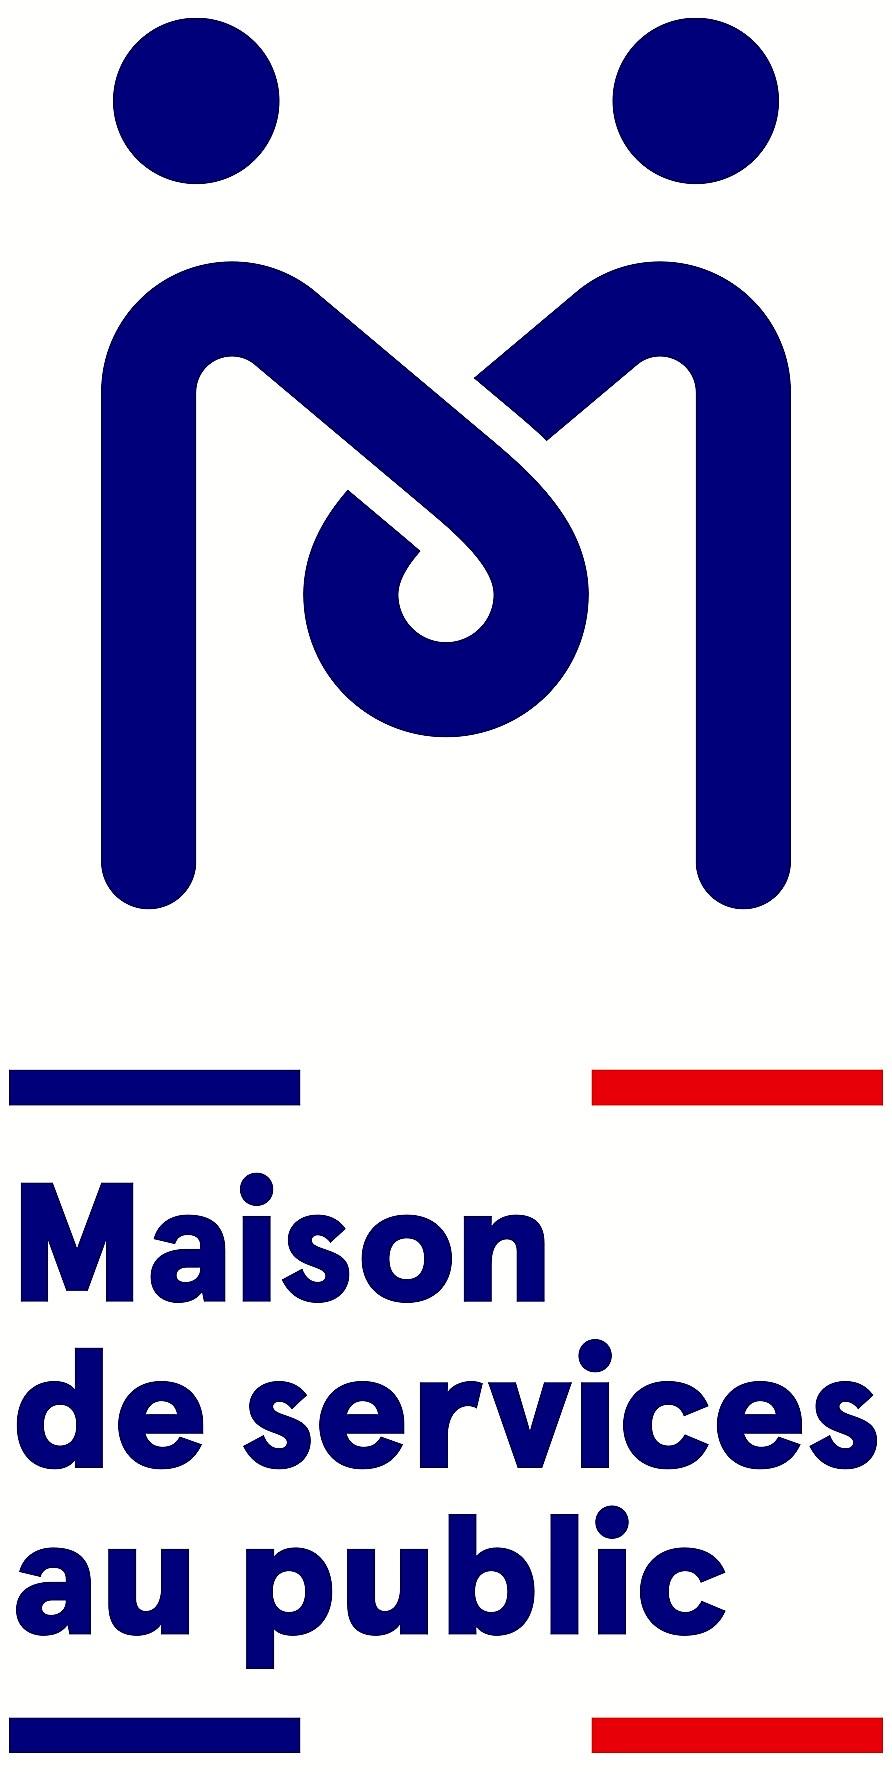 msap_logo_vertical_rvb_01